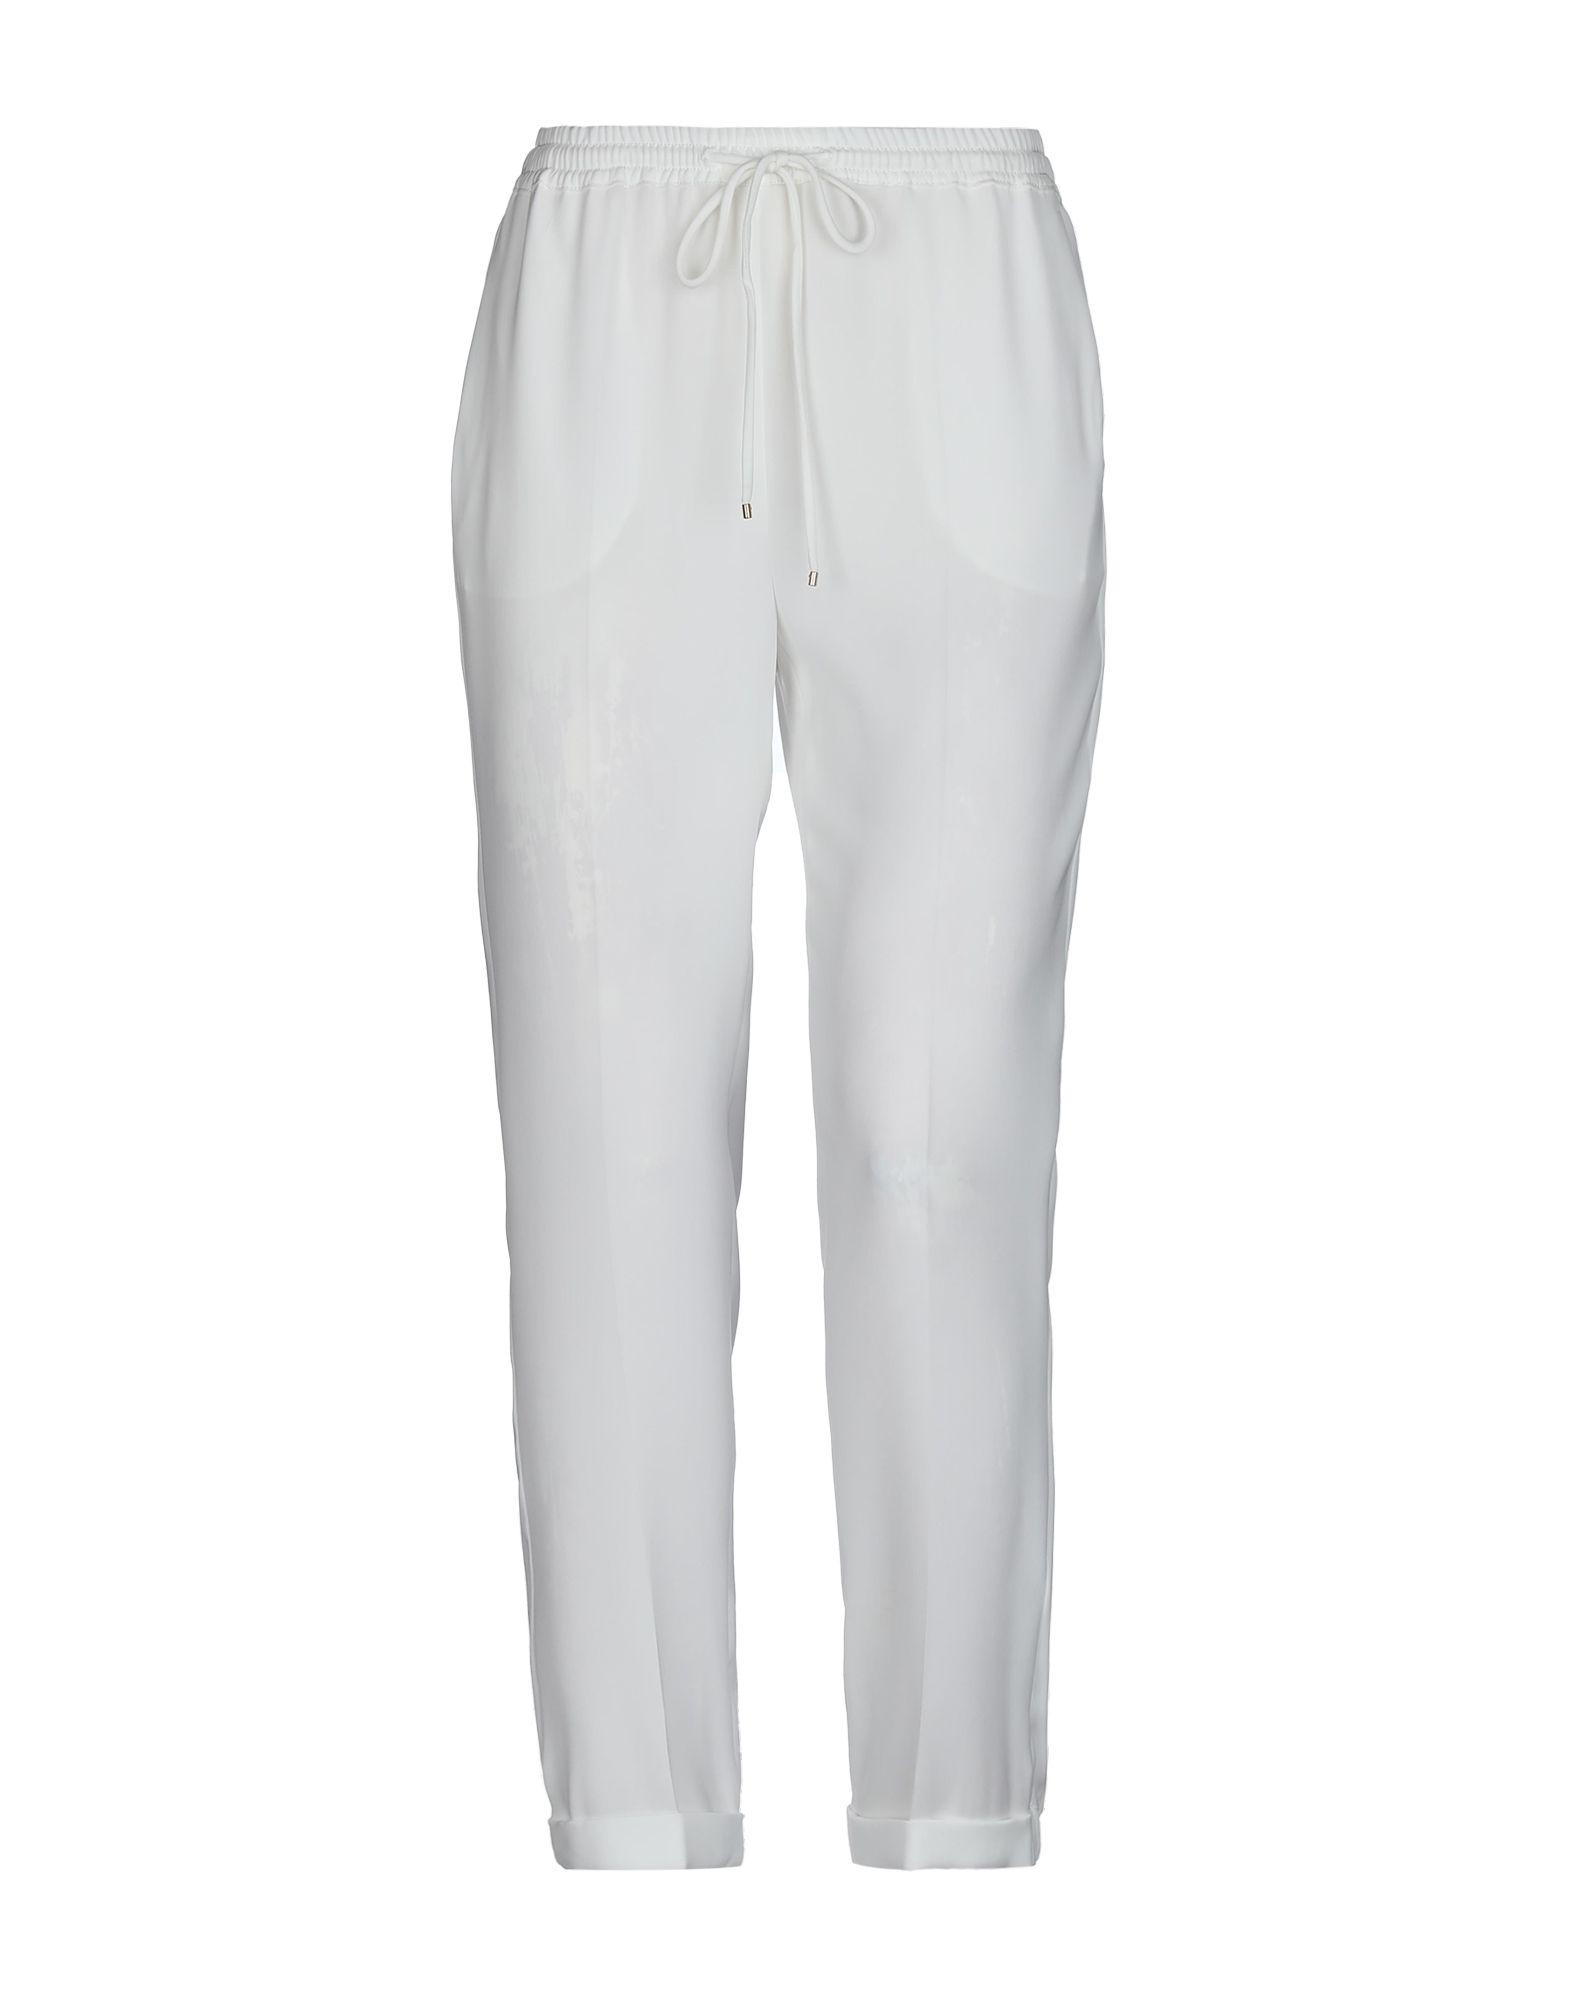 96ed8ebddd65c Max Mara Casual Pants In White